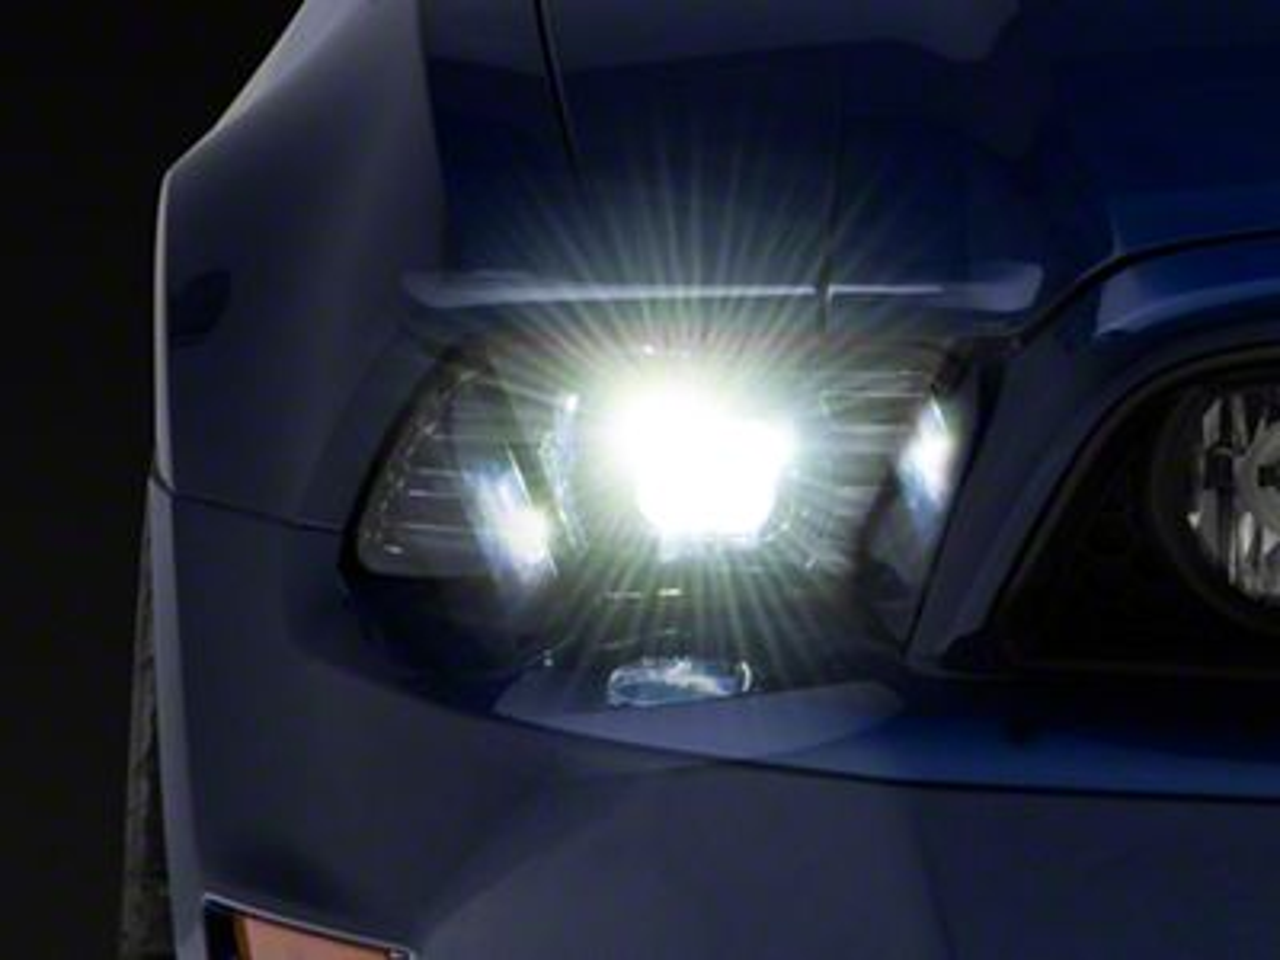 Morimoto Black XB Projector Headlights (13-14 GT, V6)